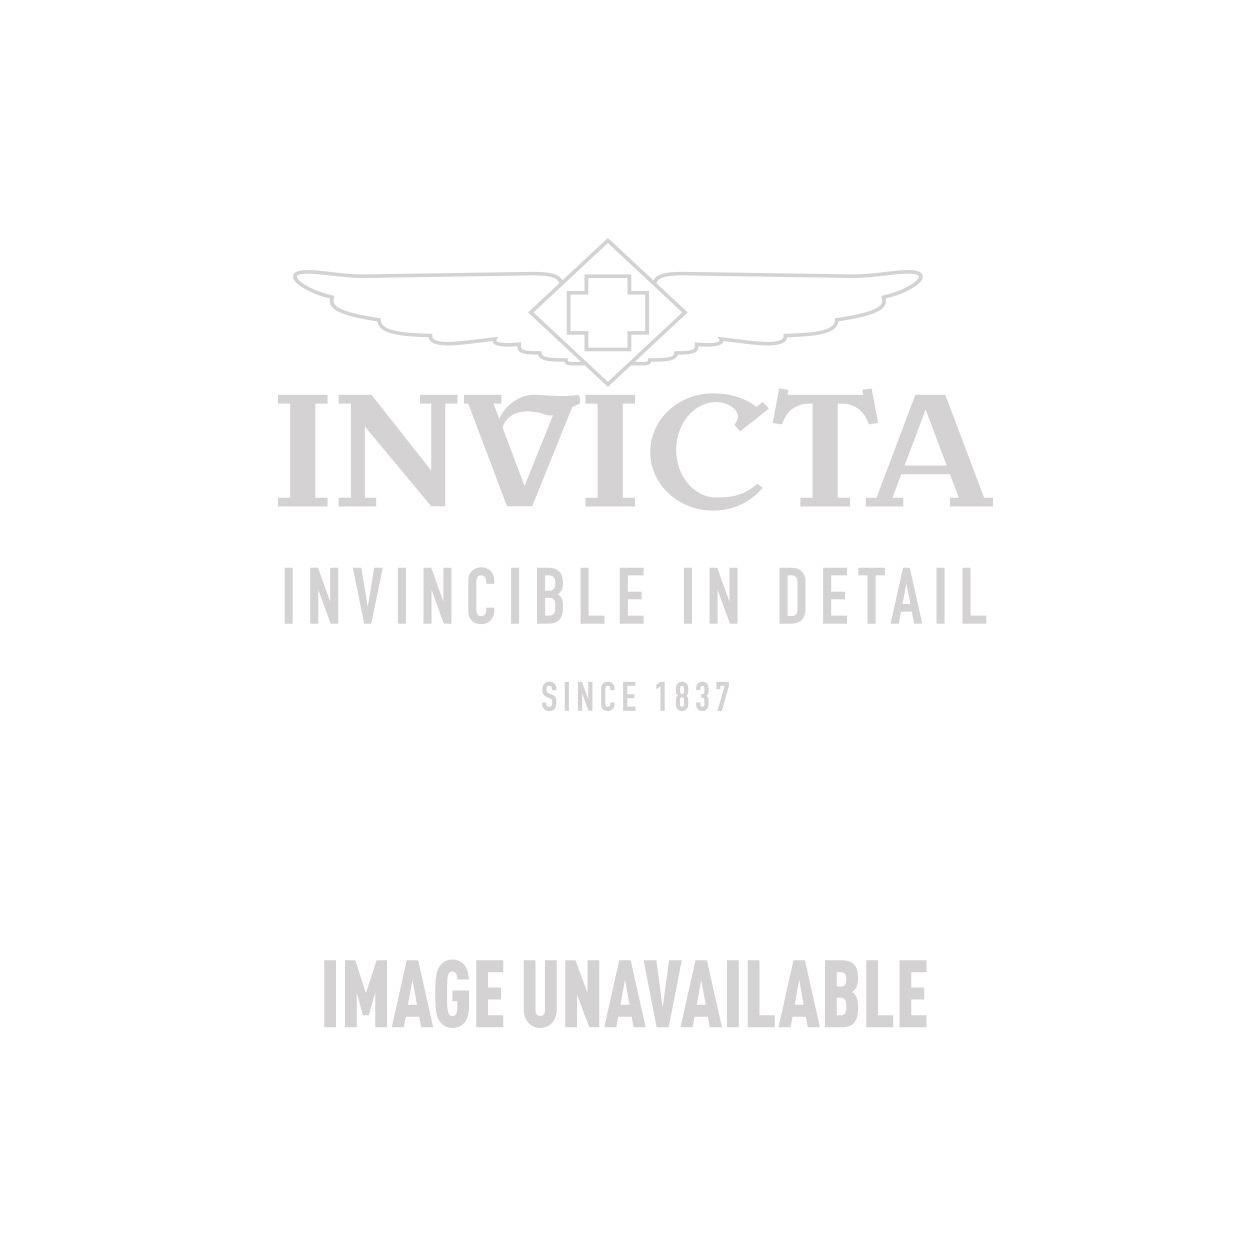 Invicta Aviator Mens Quartz 50mm Stainless Steel Case Black Dial - Model 24580